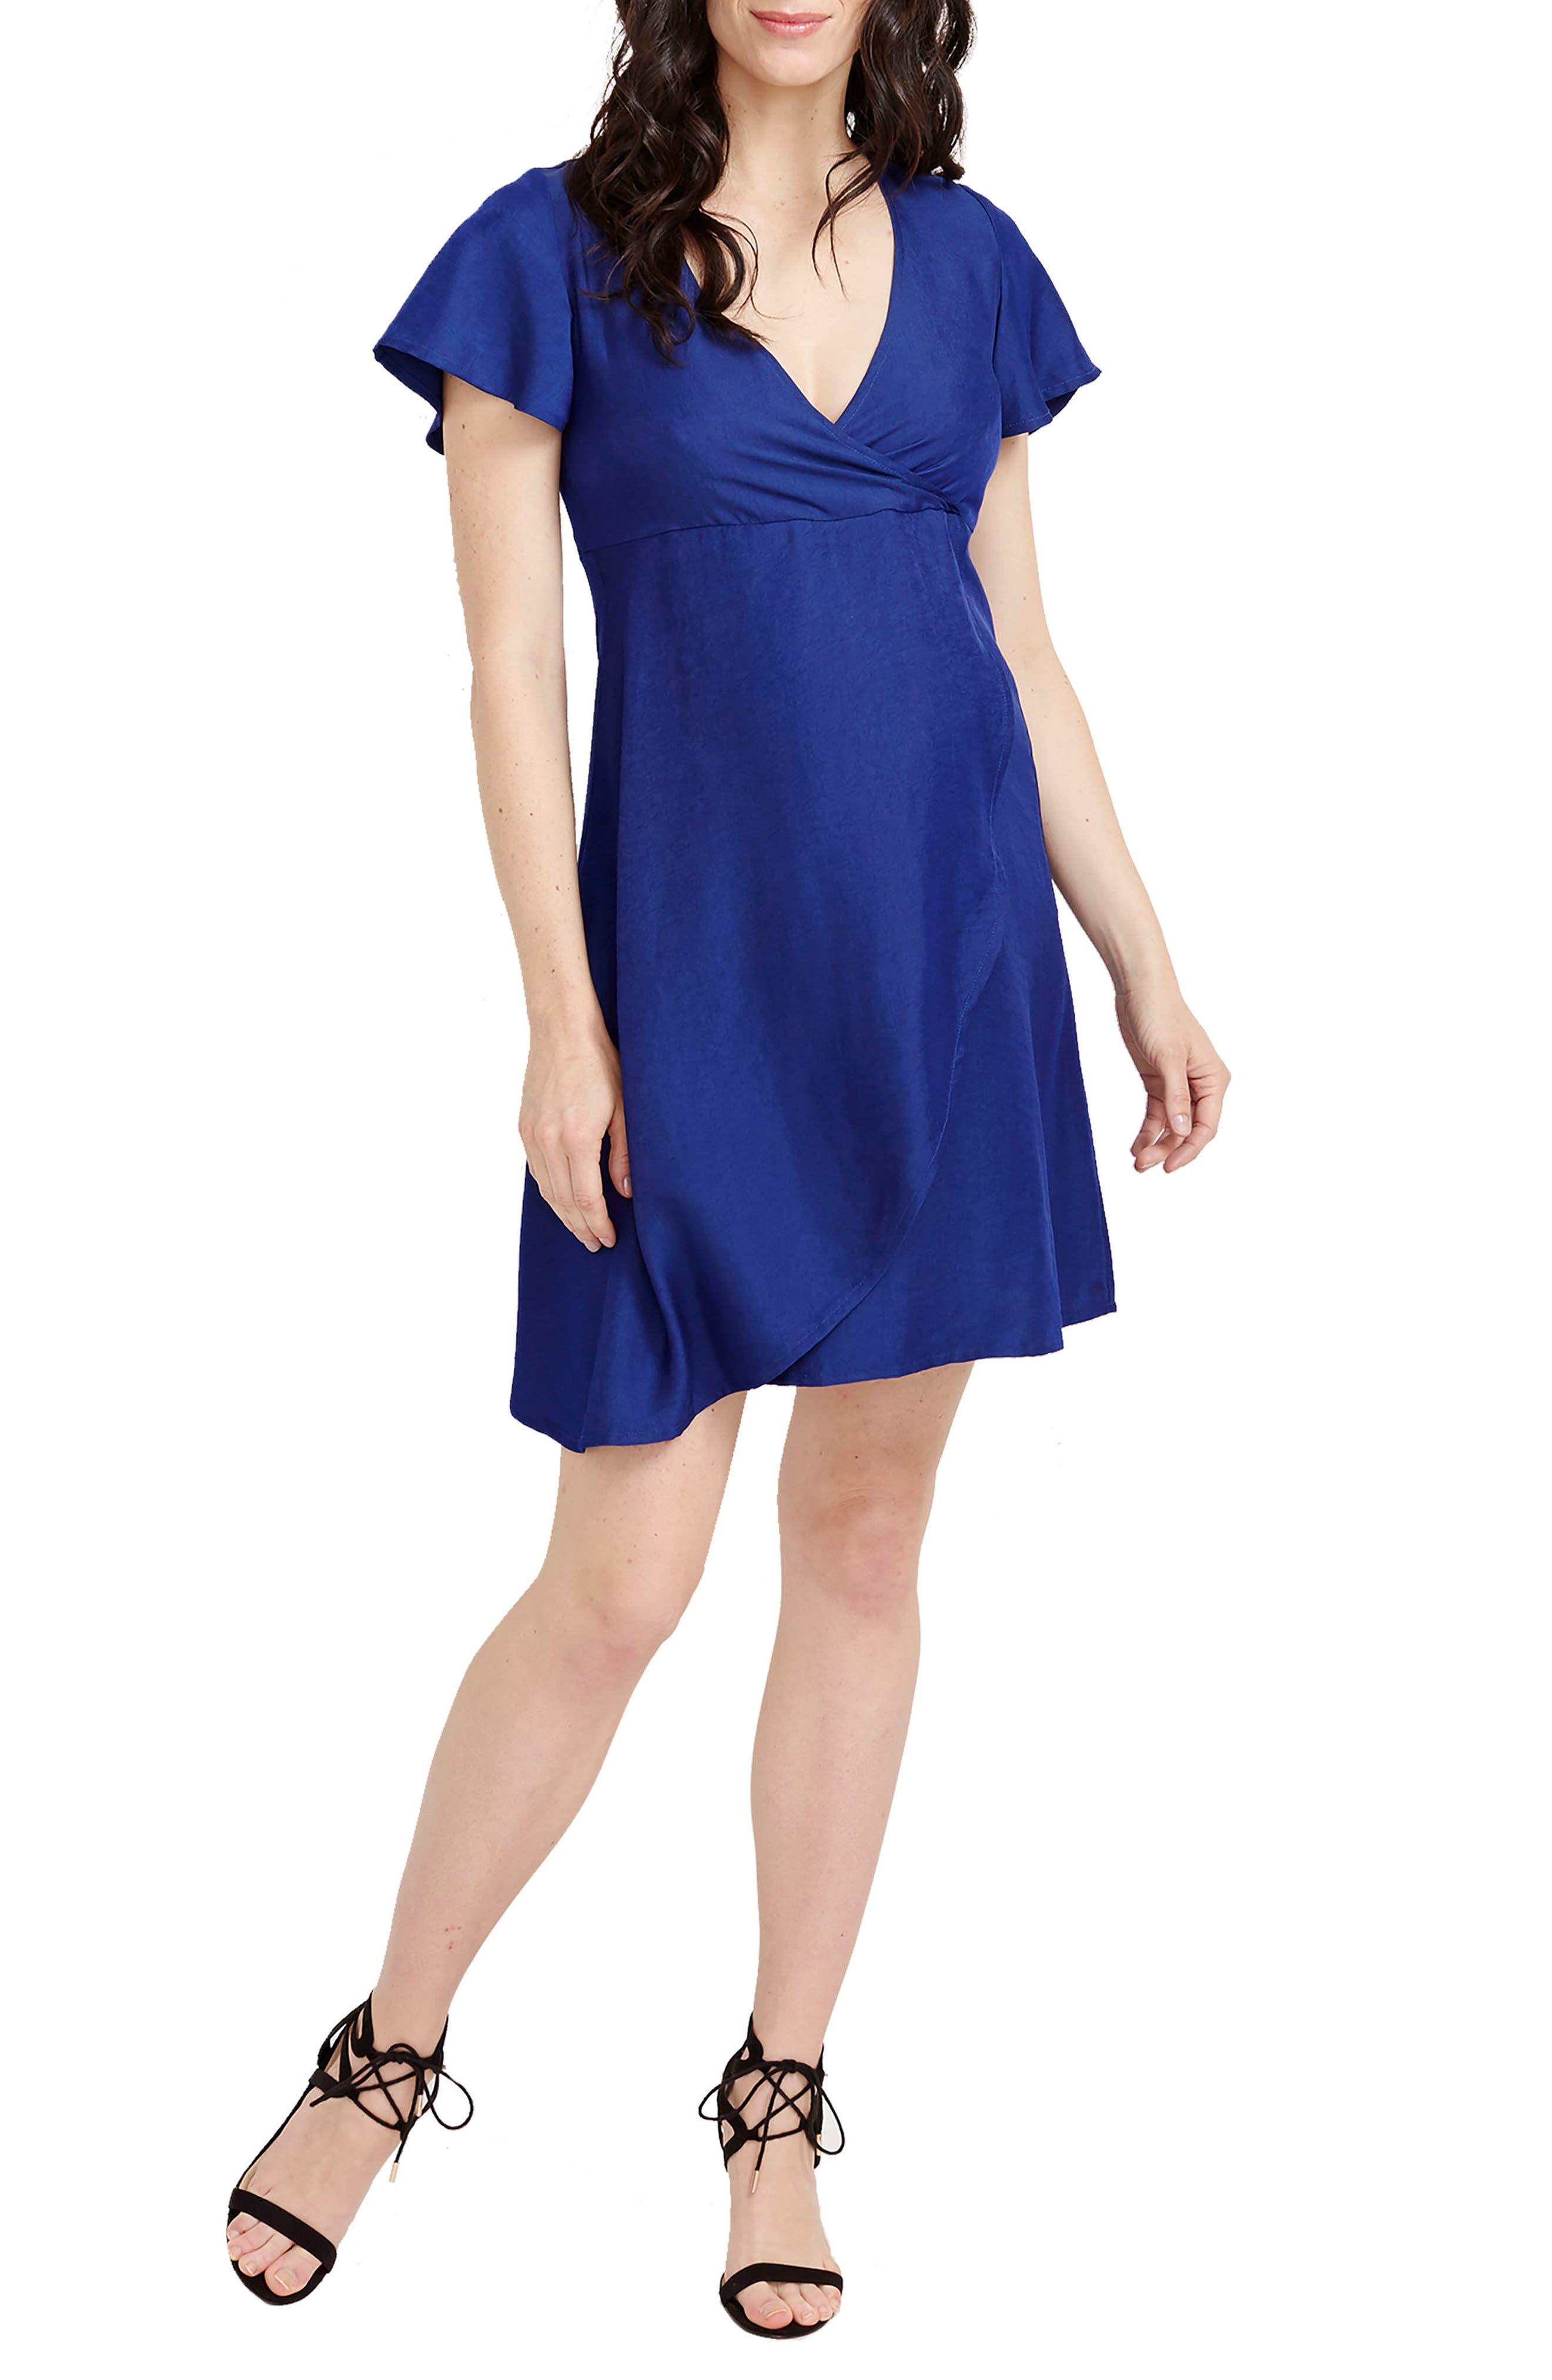 Rosie Pope Grace Maternity Dress, Blue